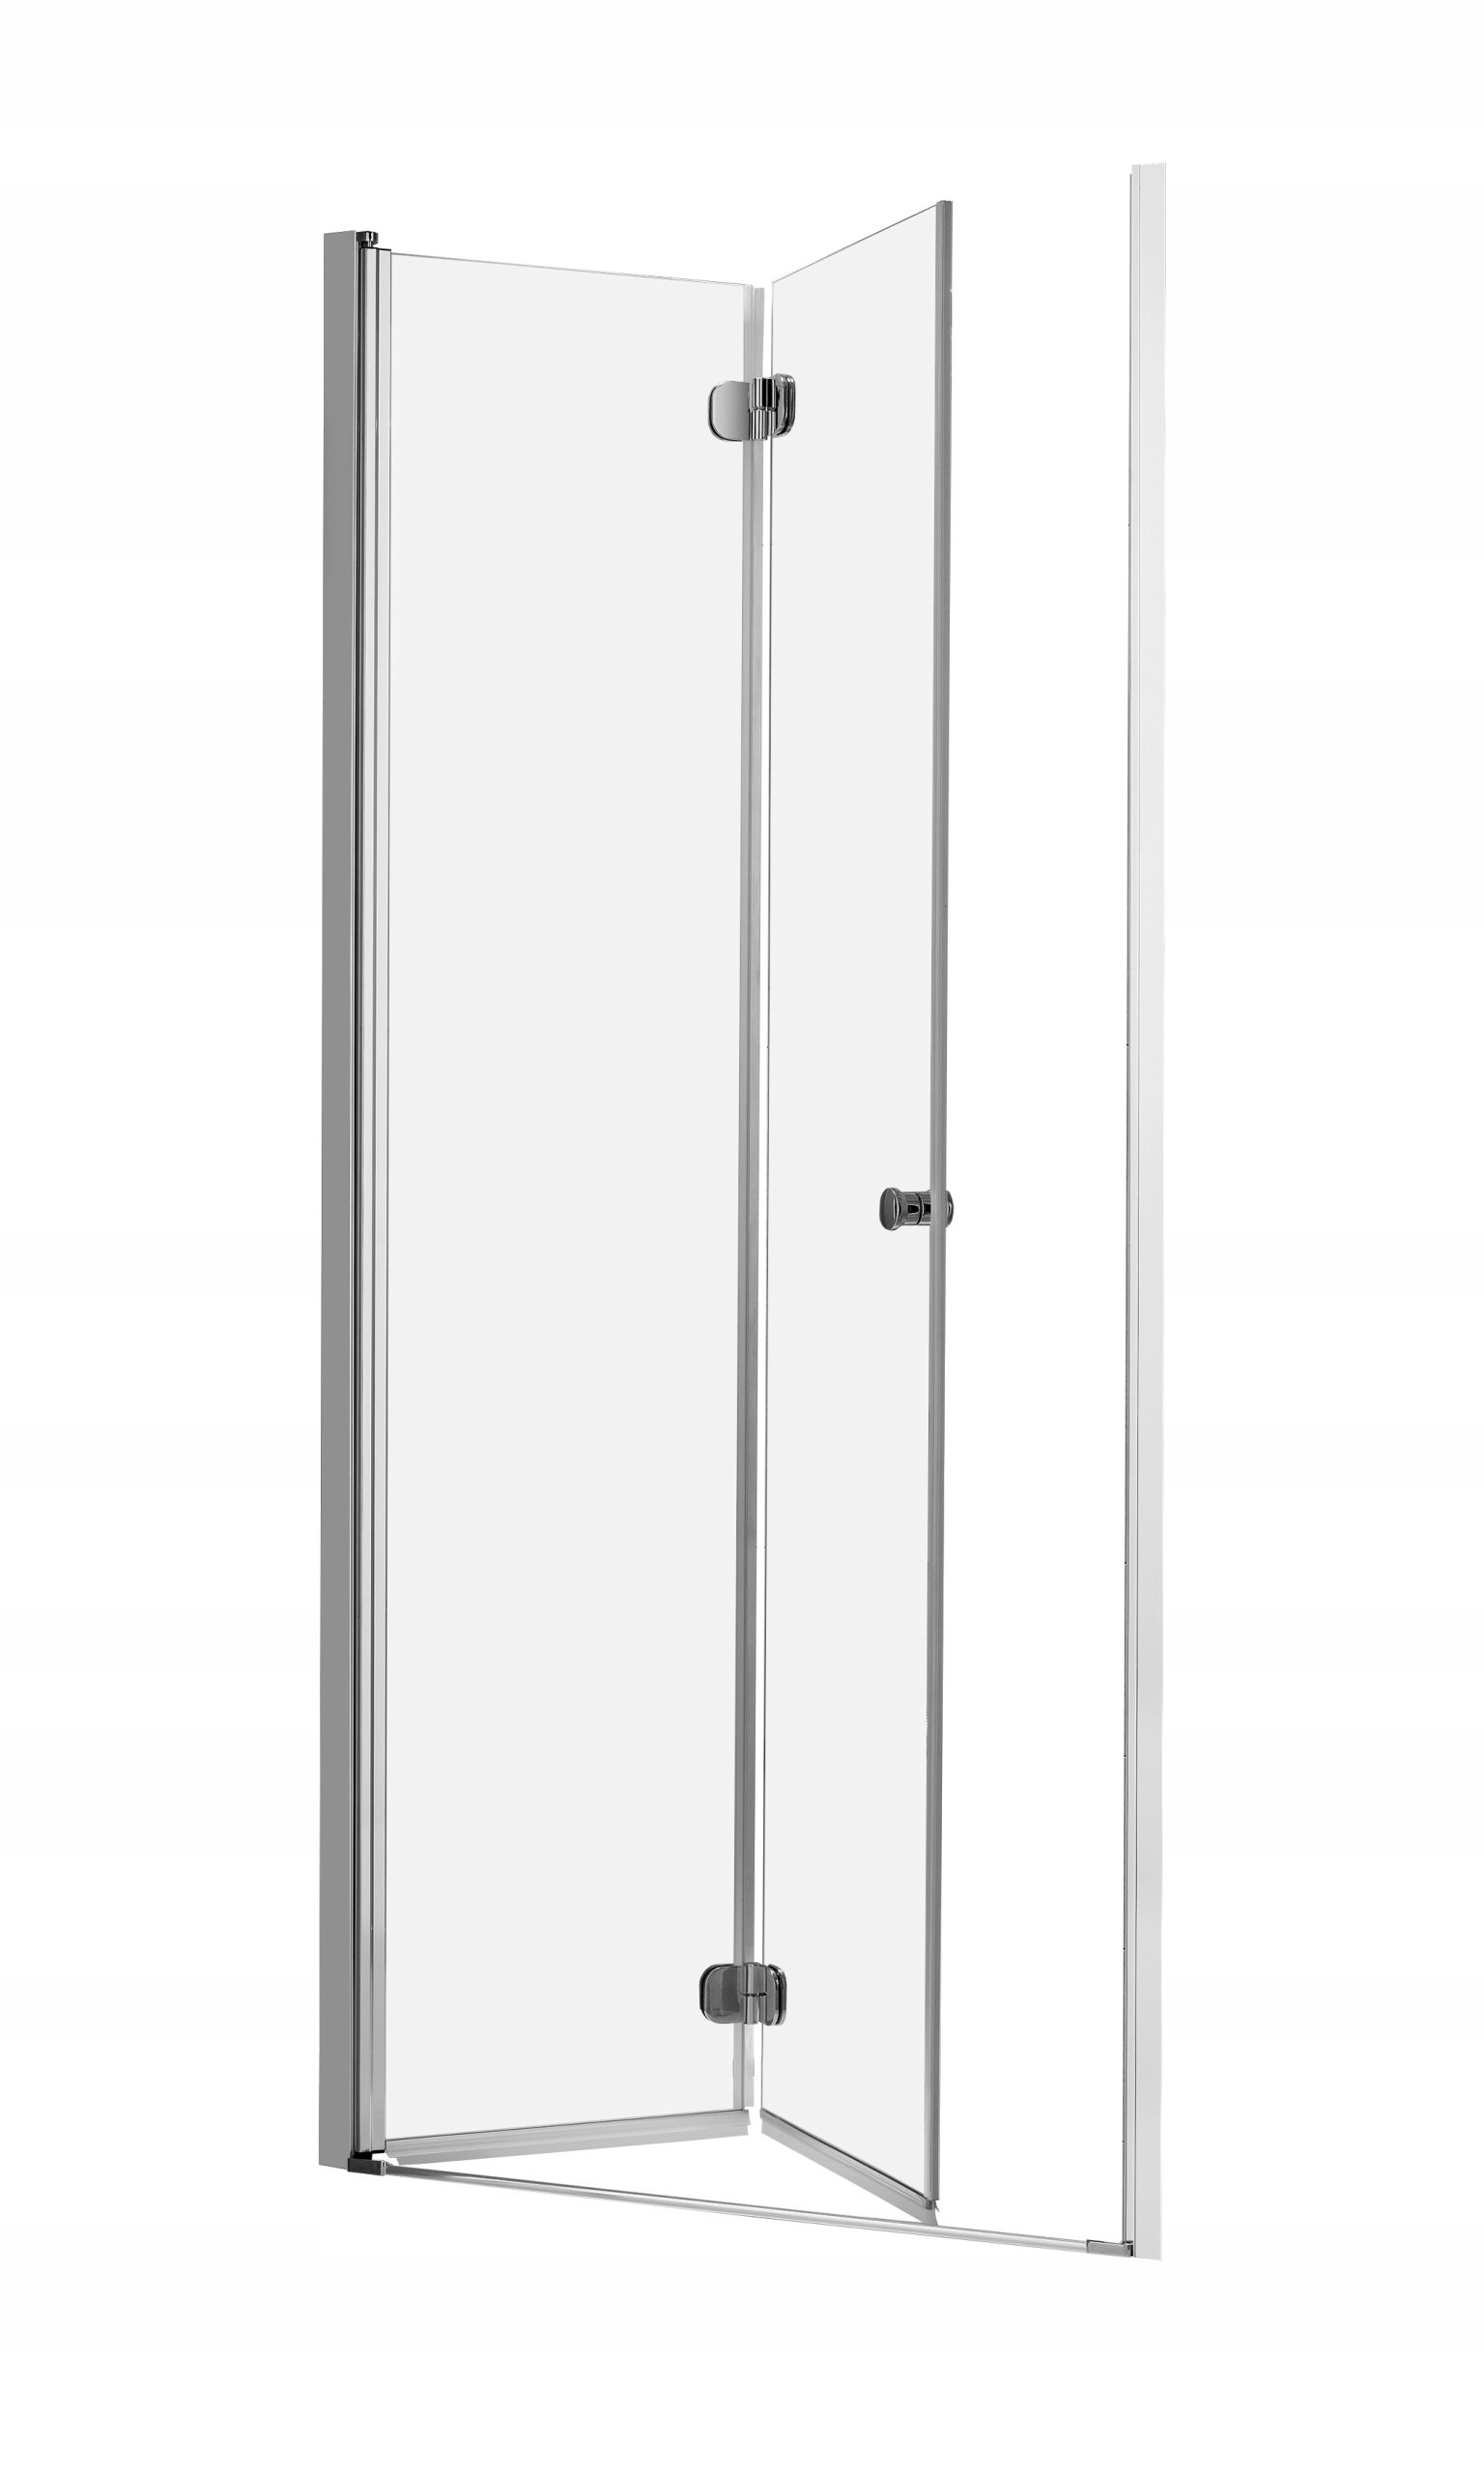 Sprchové dvere Eos DWB 90x197 cm RADAWAY